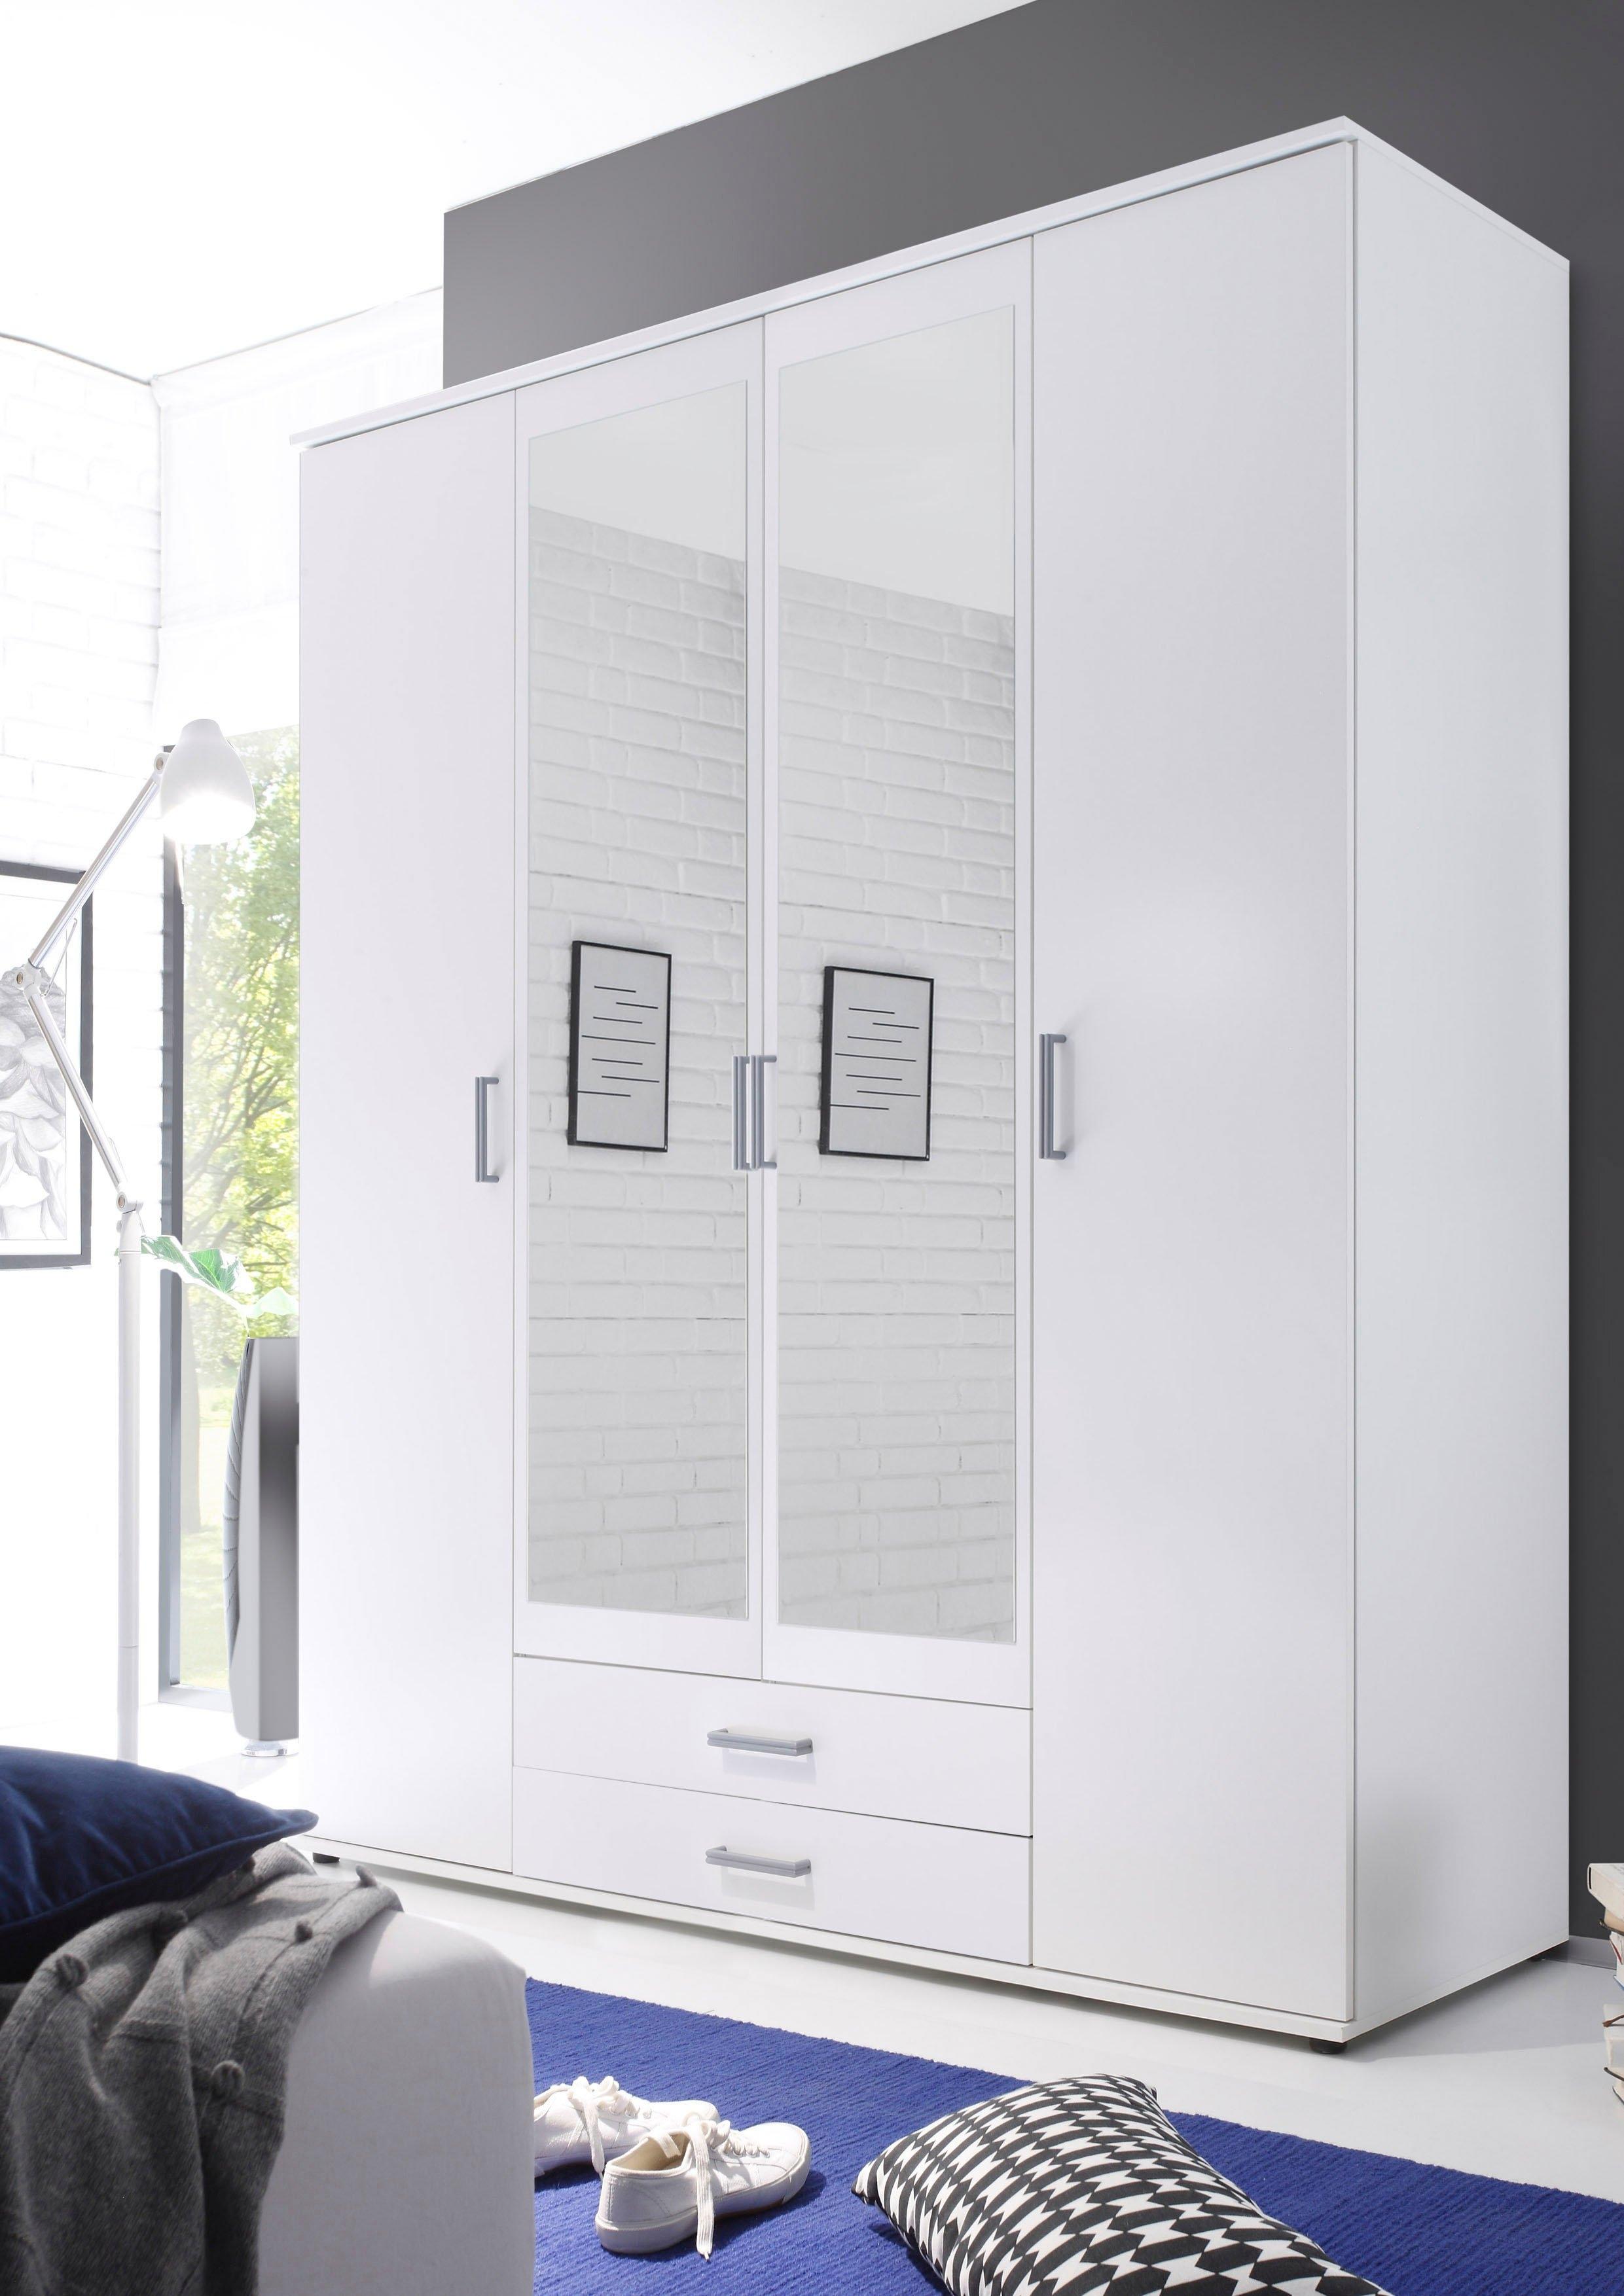 Schlafkontor kledingkast Karl in 2 breedtes online kopen op otto.nl